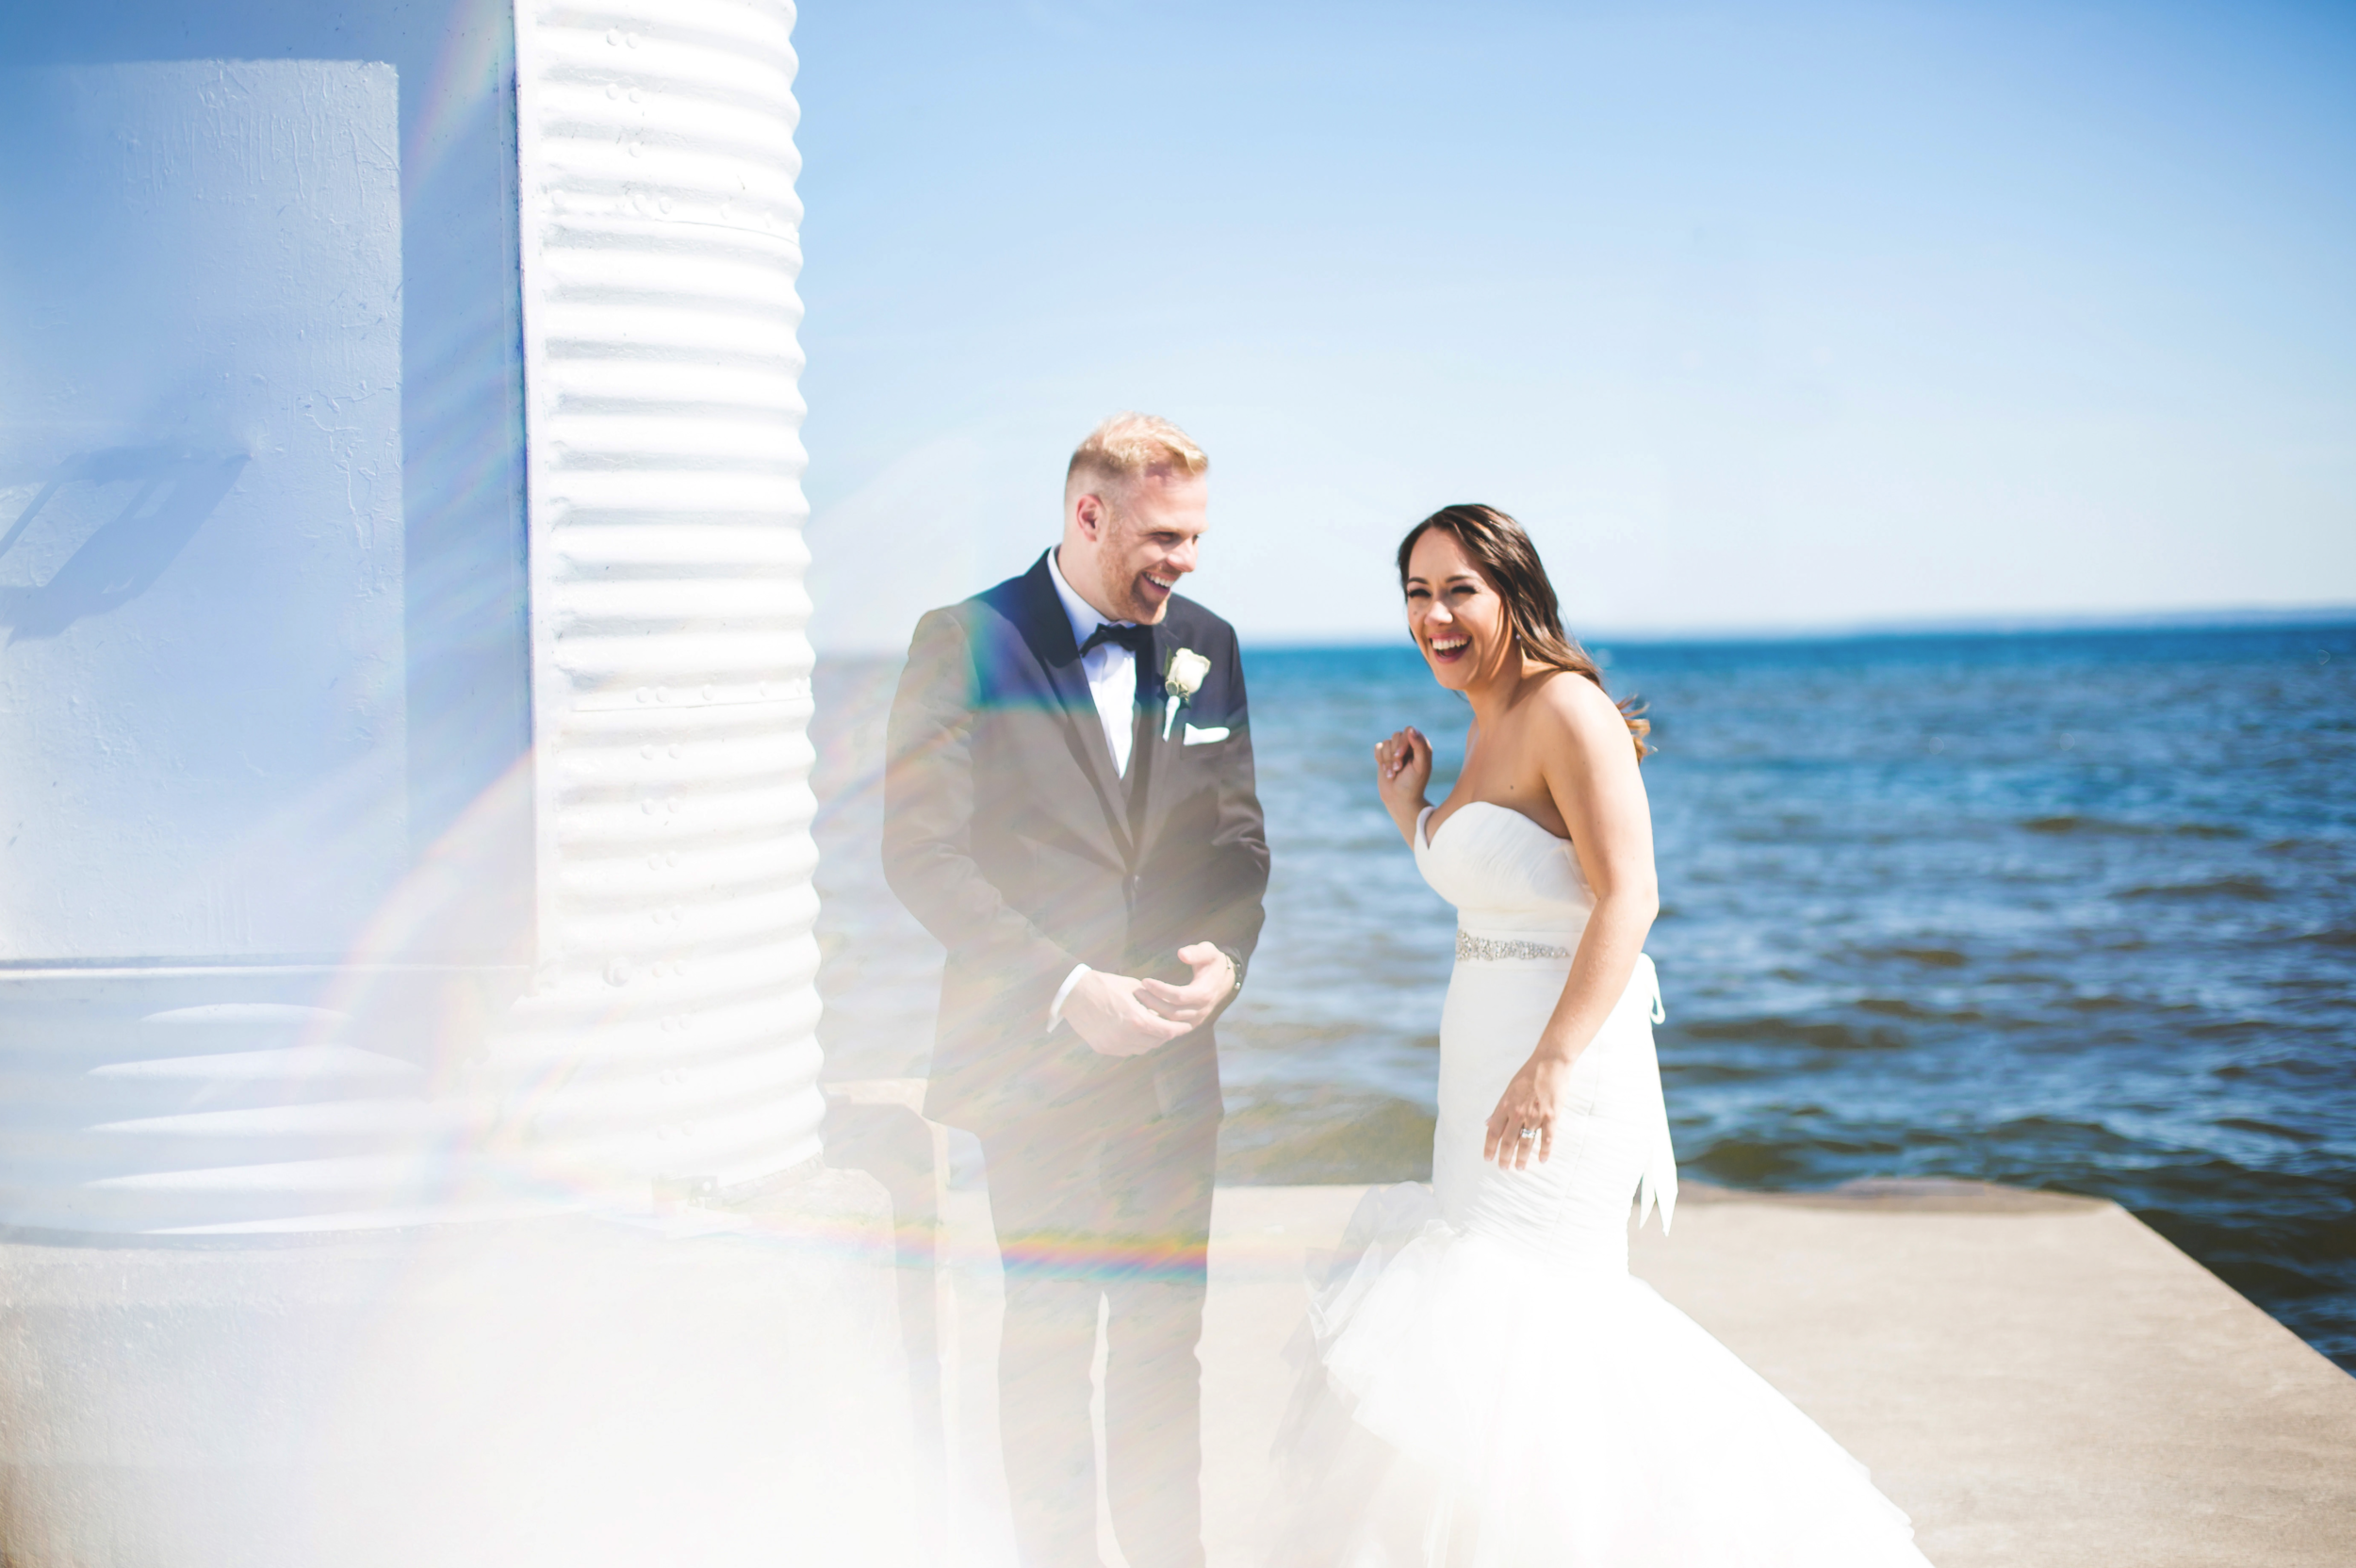 Wedding-Harbour-Banquet-Center-Oakville-Photographer-Wedding-Hamilton-Saint-James-Espresso-Downtown-HamOnt-GTA-Niagara-Toronto-Moments-by-Lauren-Photography-Photo-Image-43.png